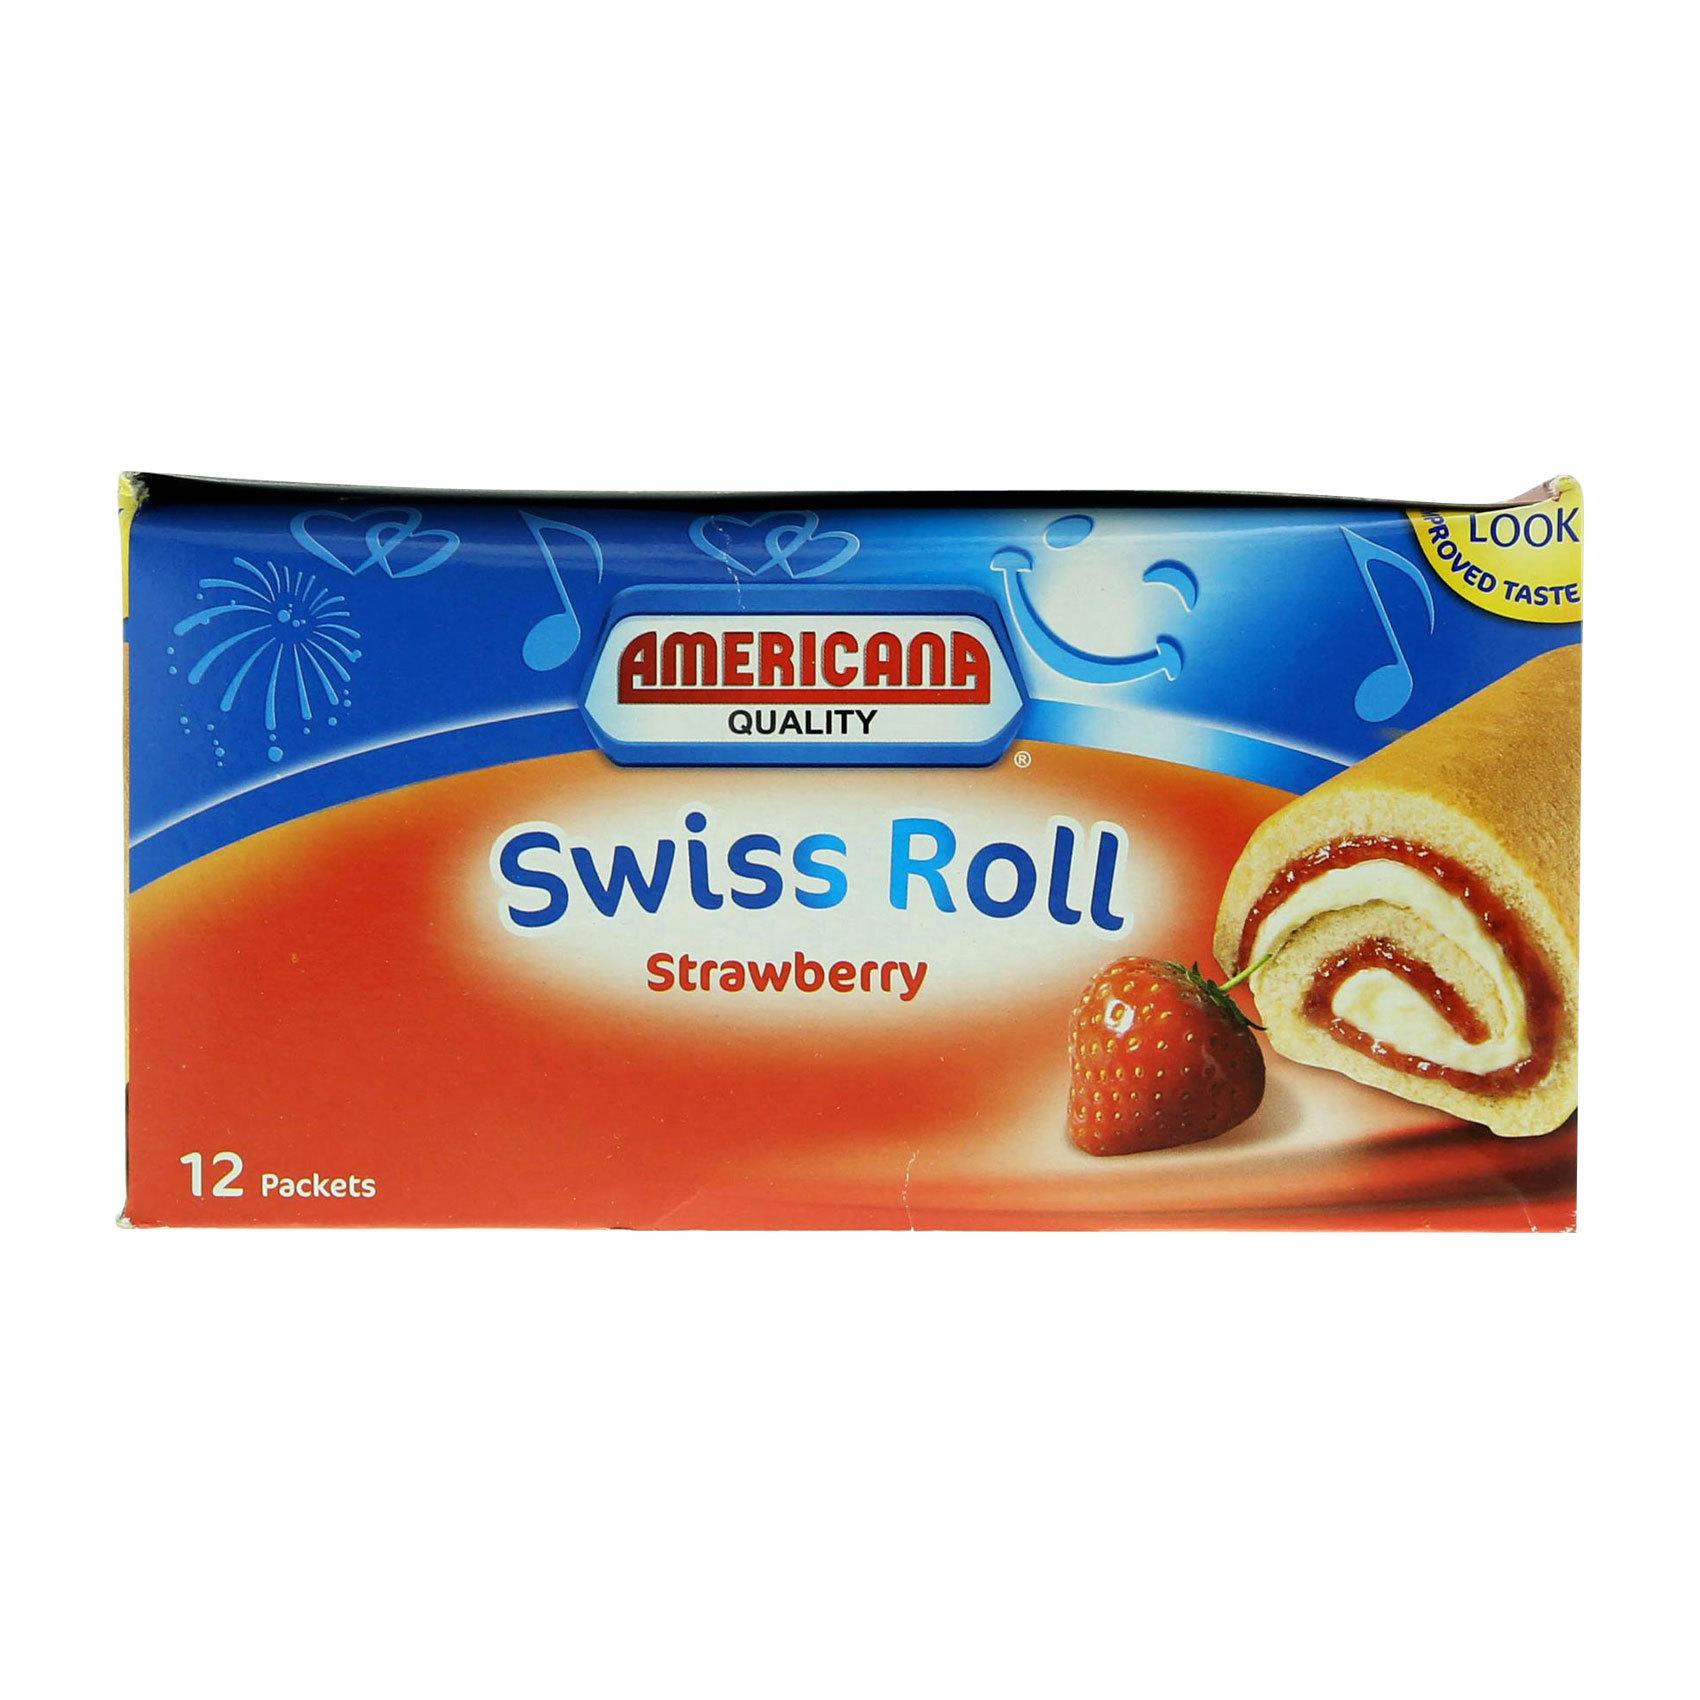 AMERICANA SWISS ROLL STRAW 55GX12